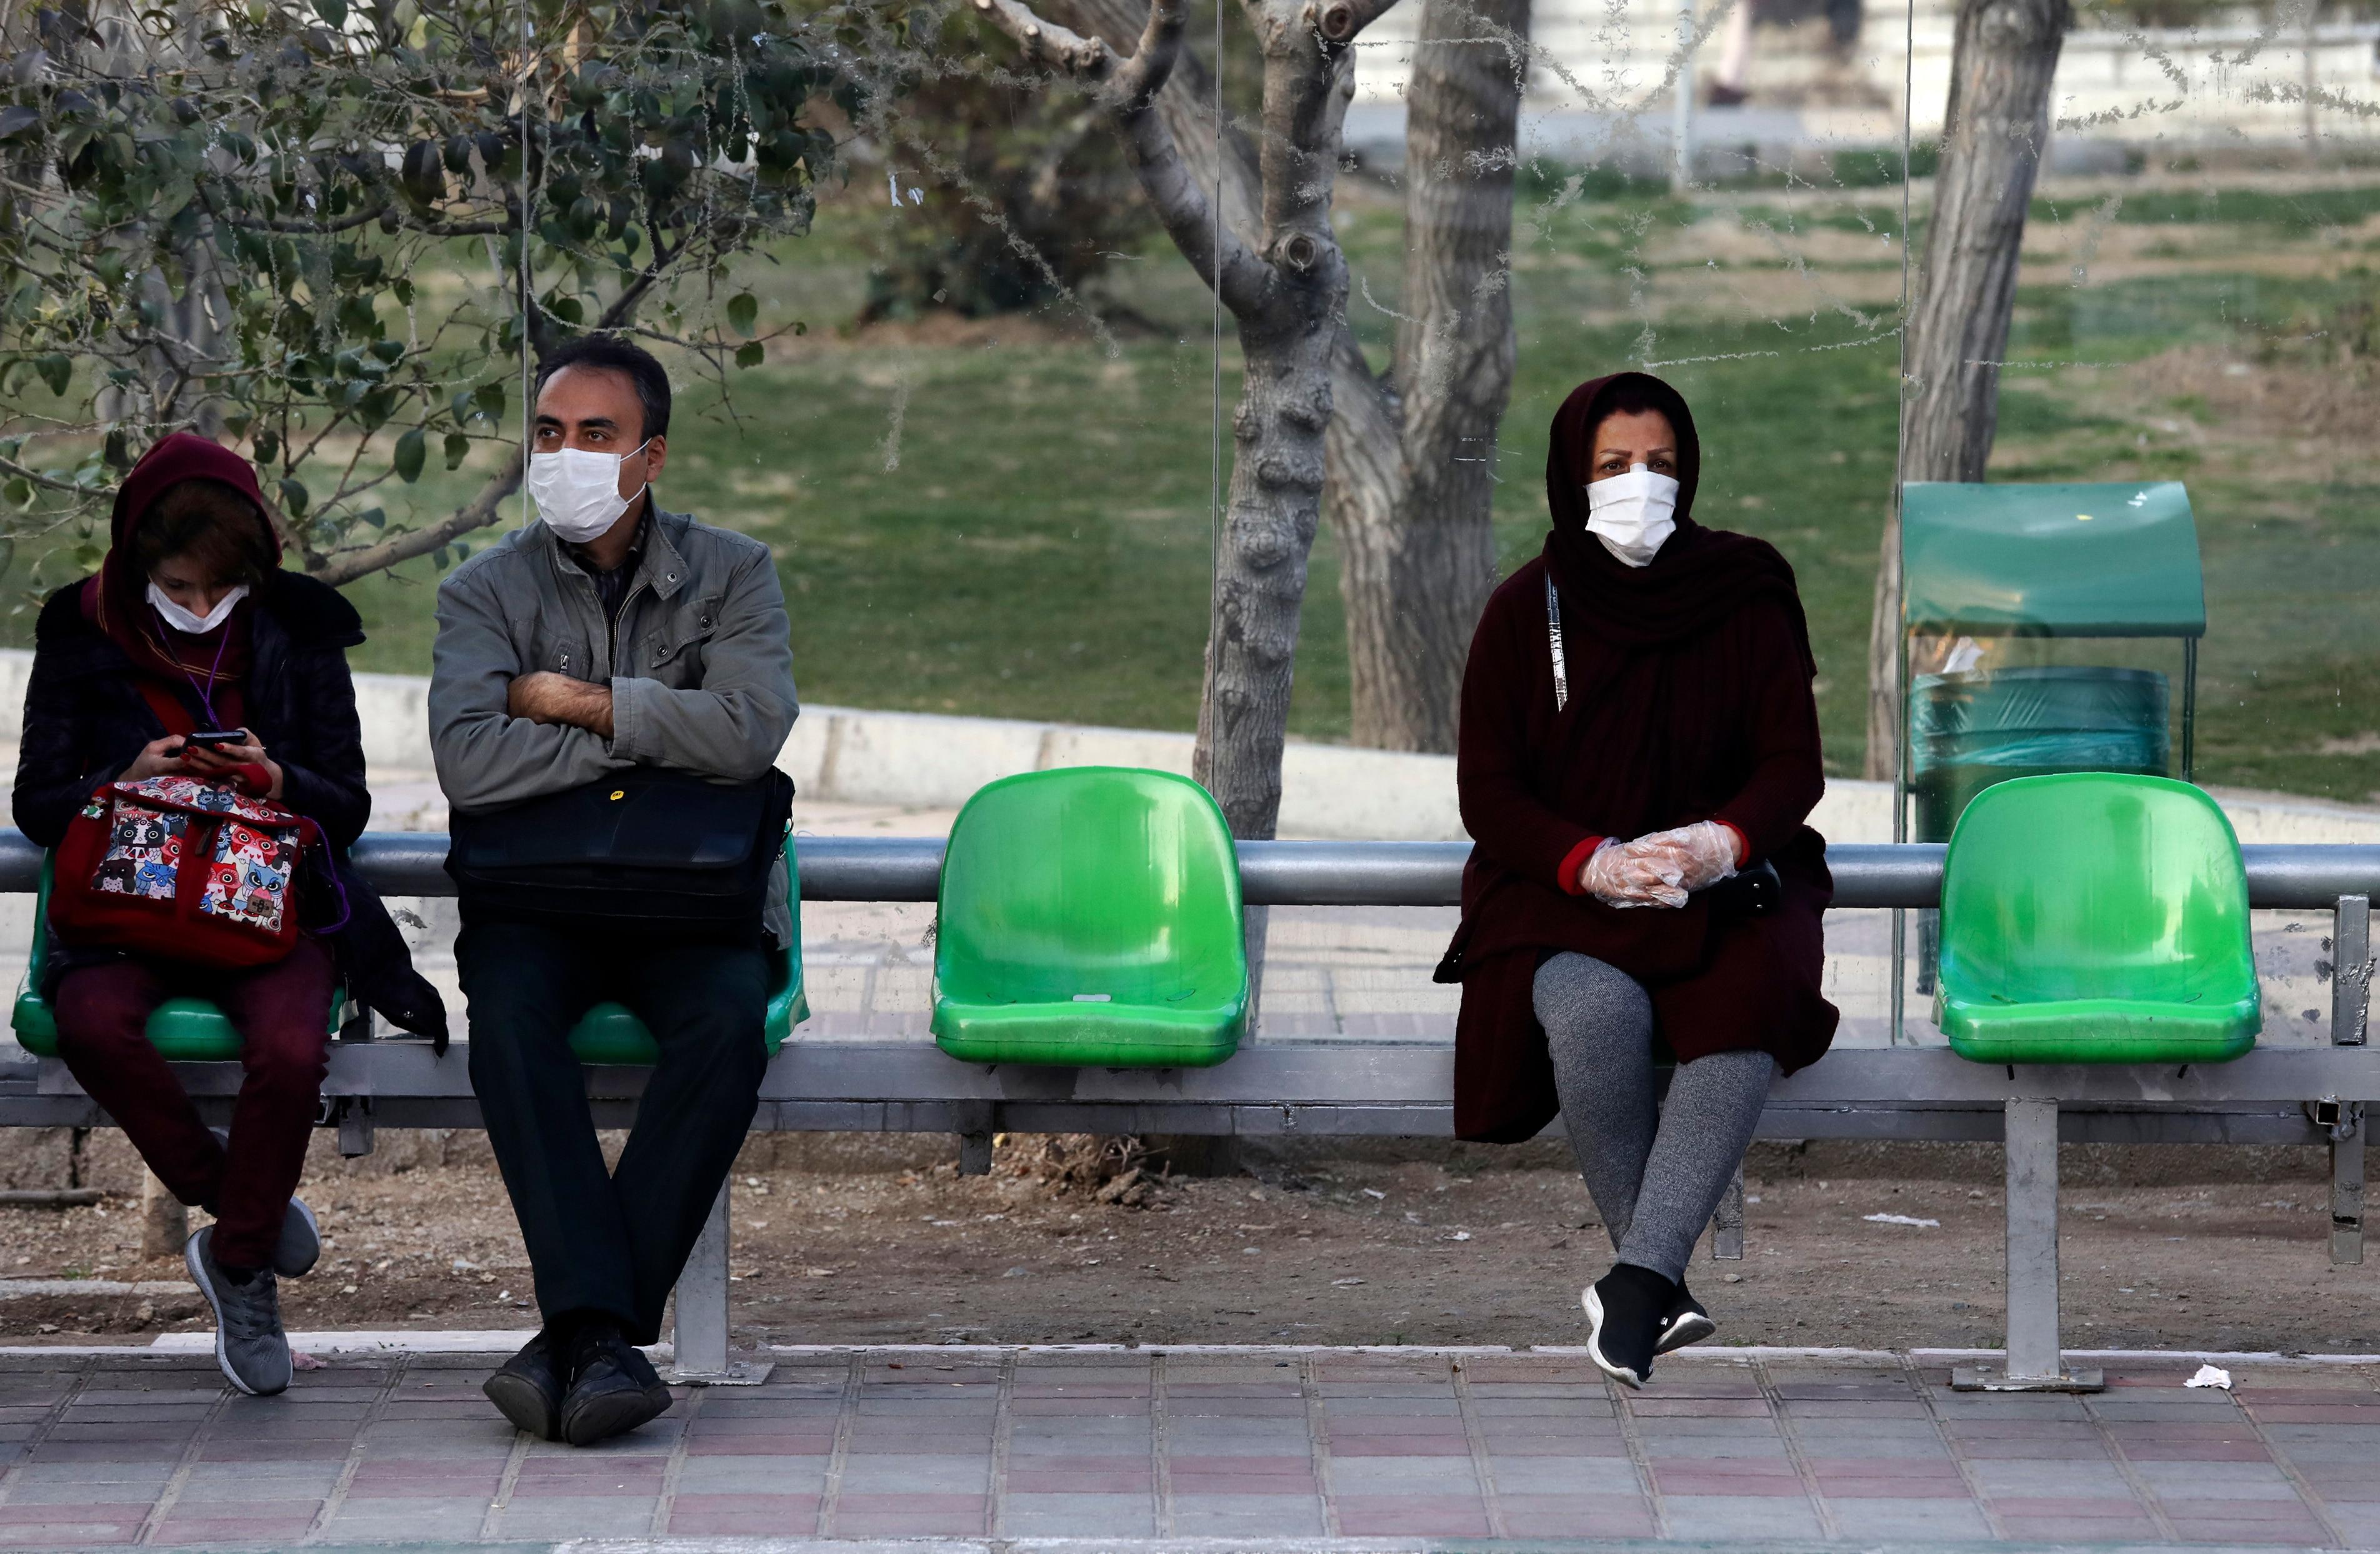 People wearing face masks wait for bus in a bus stop in a street in western Tehran, Iran.